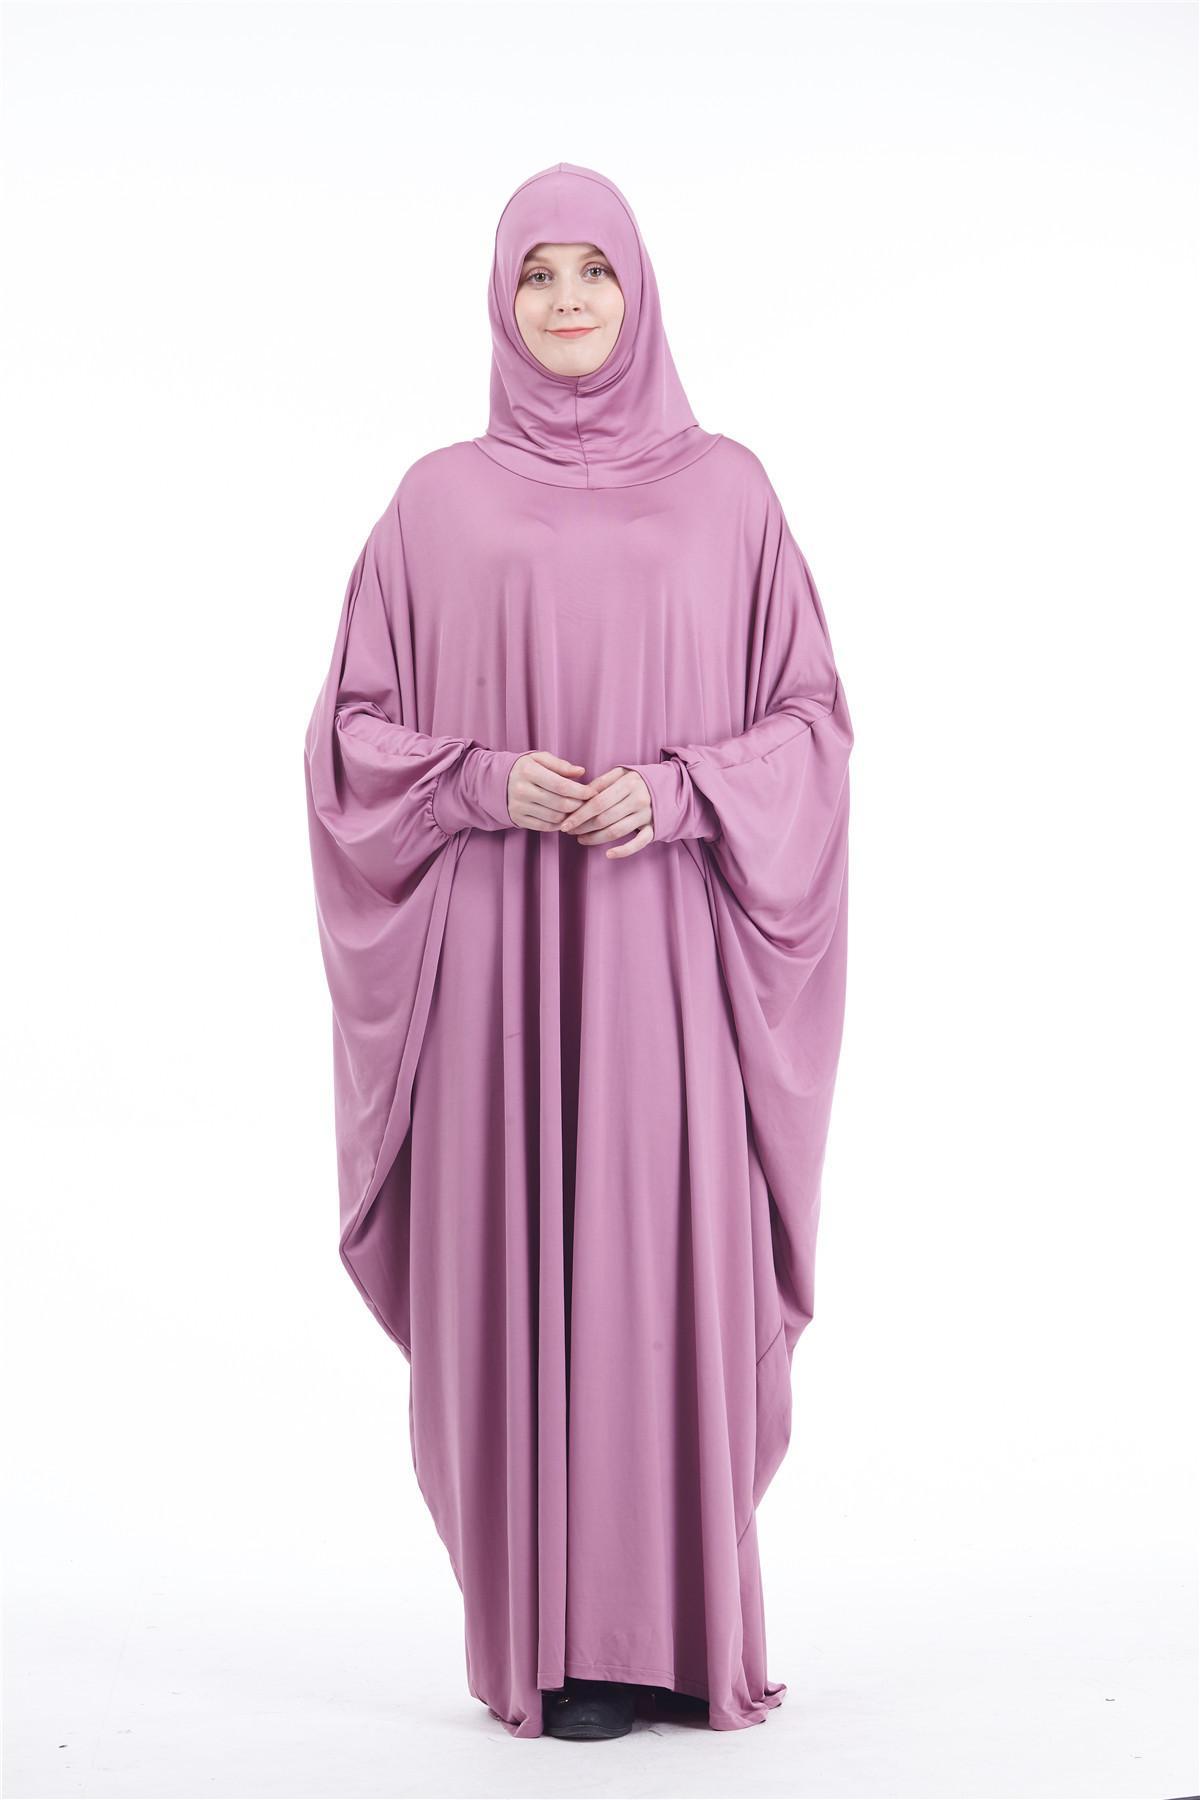 Image 5 - Abaya Kaftan Jilbab Full Cover Prayer Garment Hijab Long Maxi  Dress Overhead Muslim Robe Gown Solid Color Loose Dresses  FashionIslamic Clothing